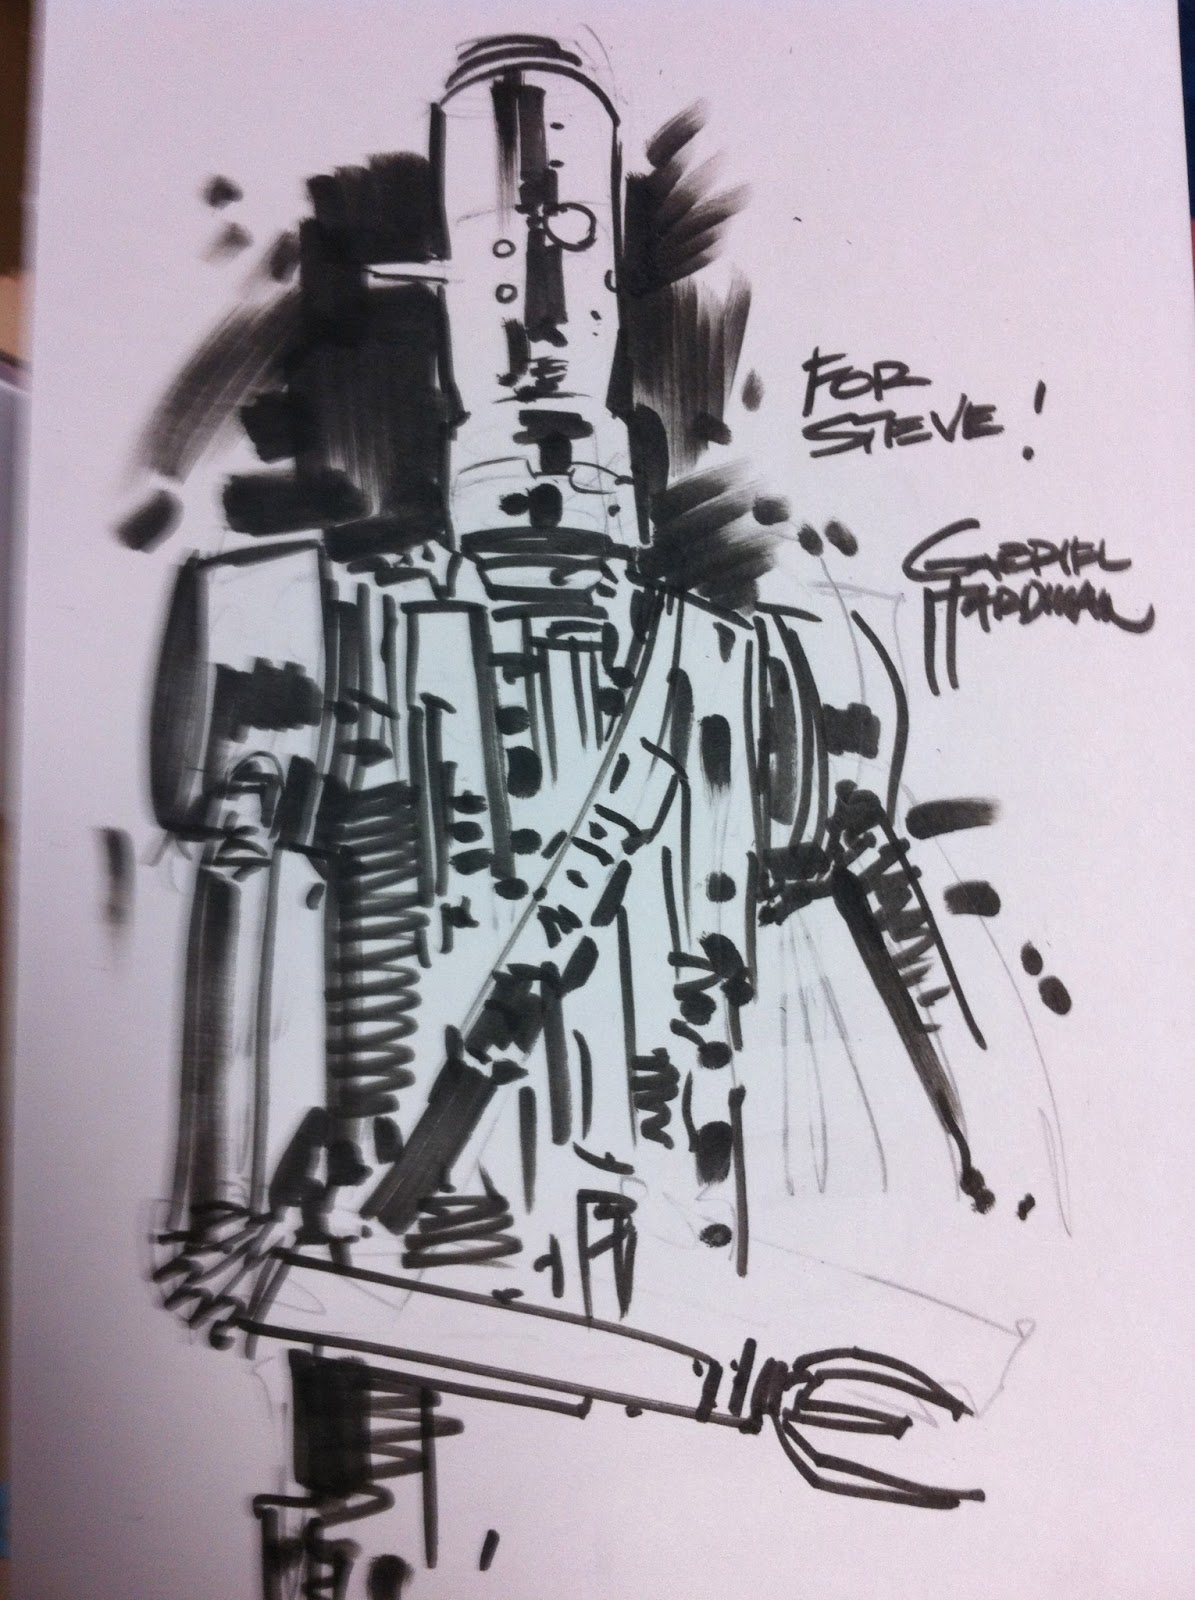 gabriel hardman beach ball comics signing sketches